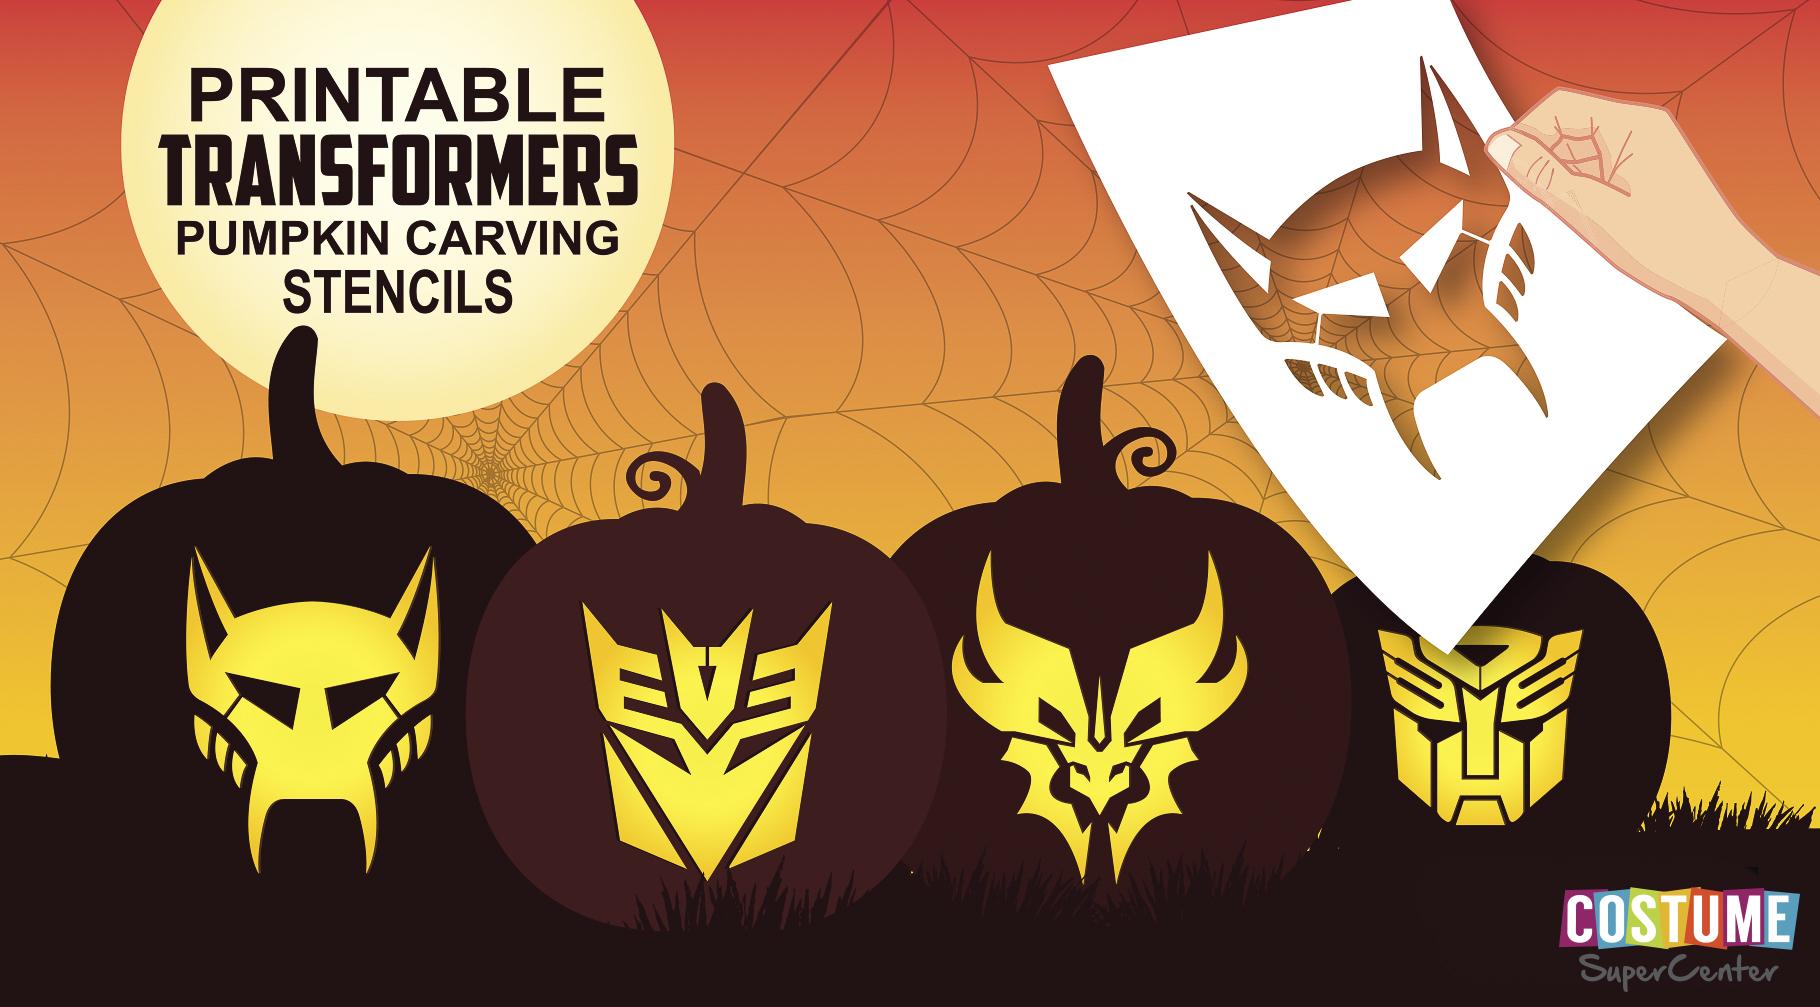 Free Printable Pumpkin Carving Stencils